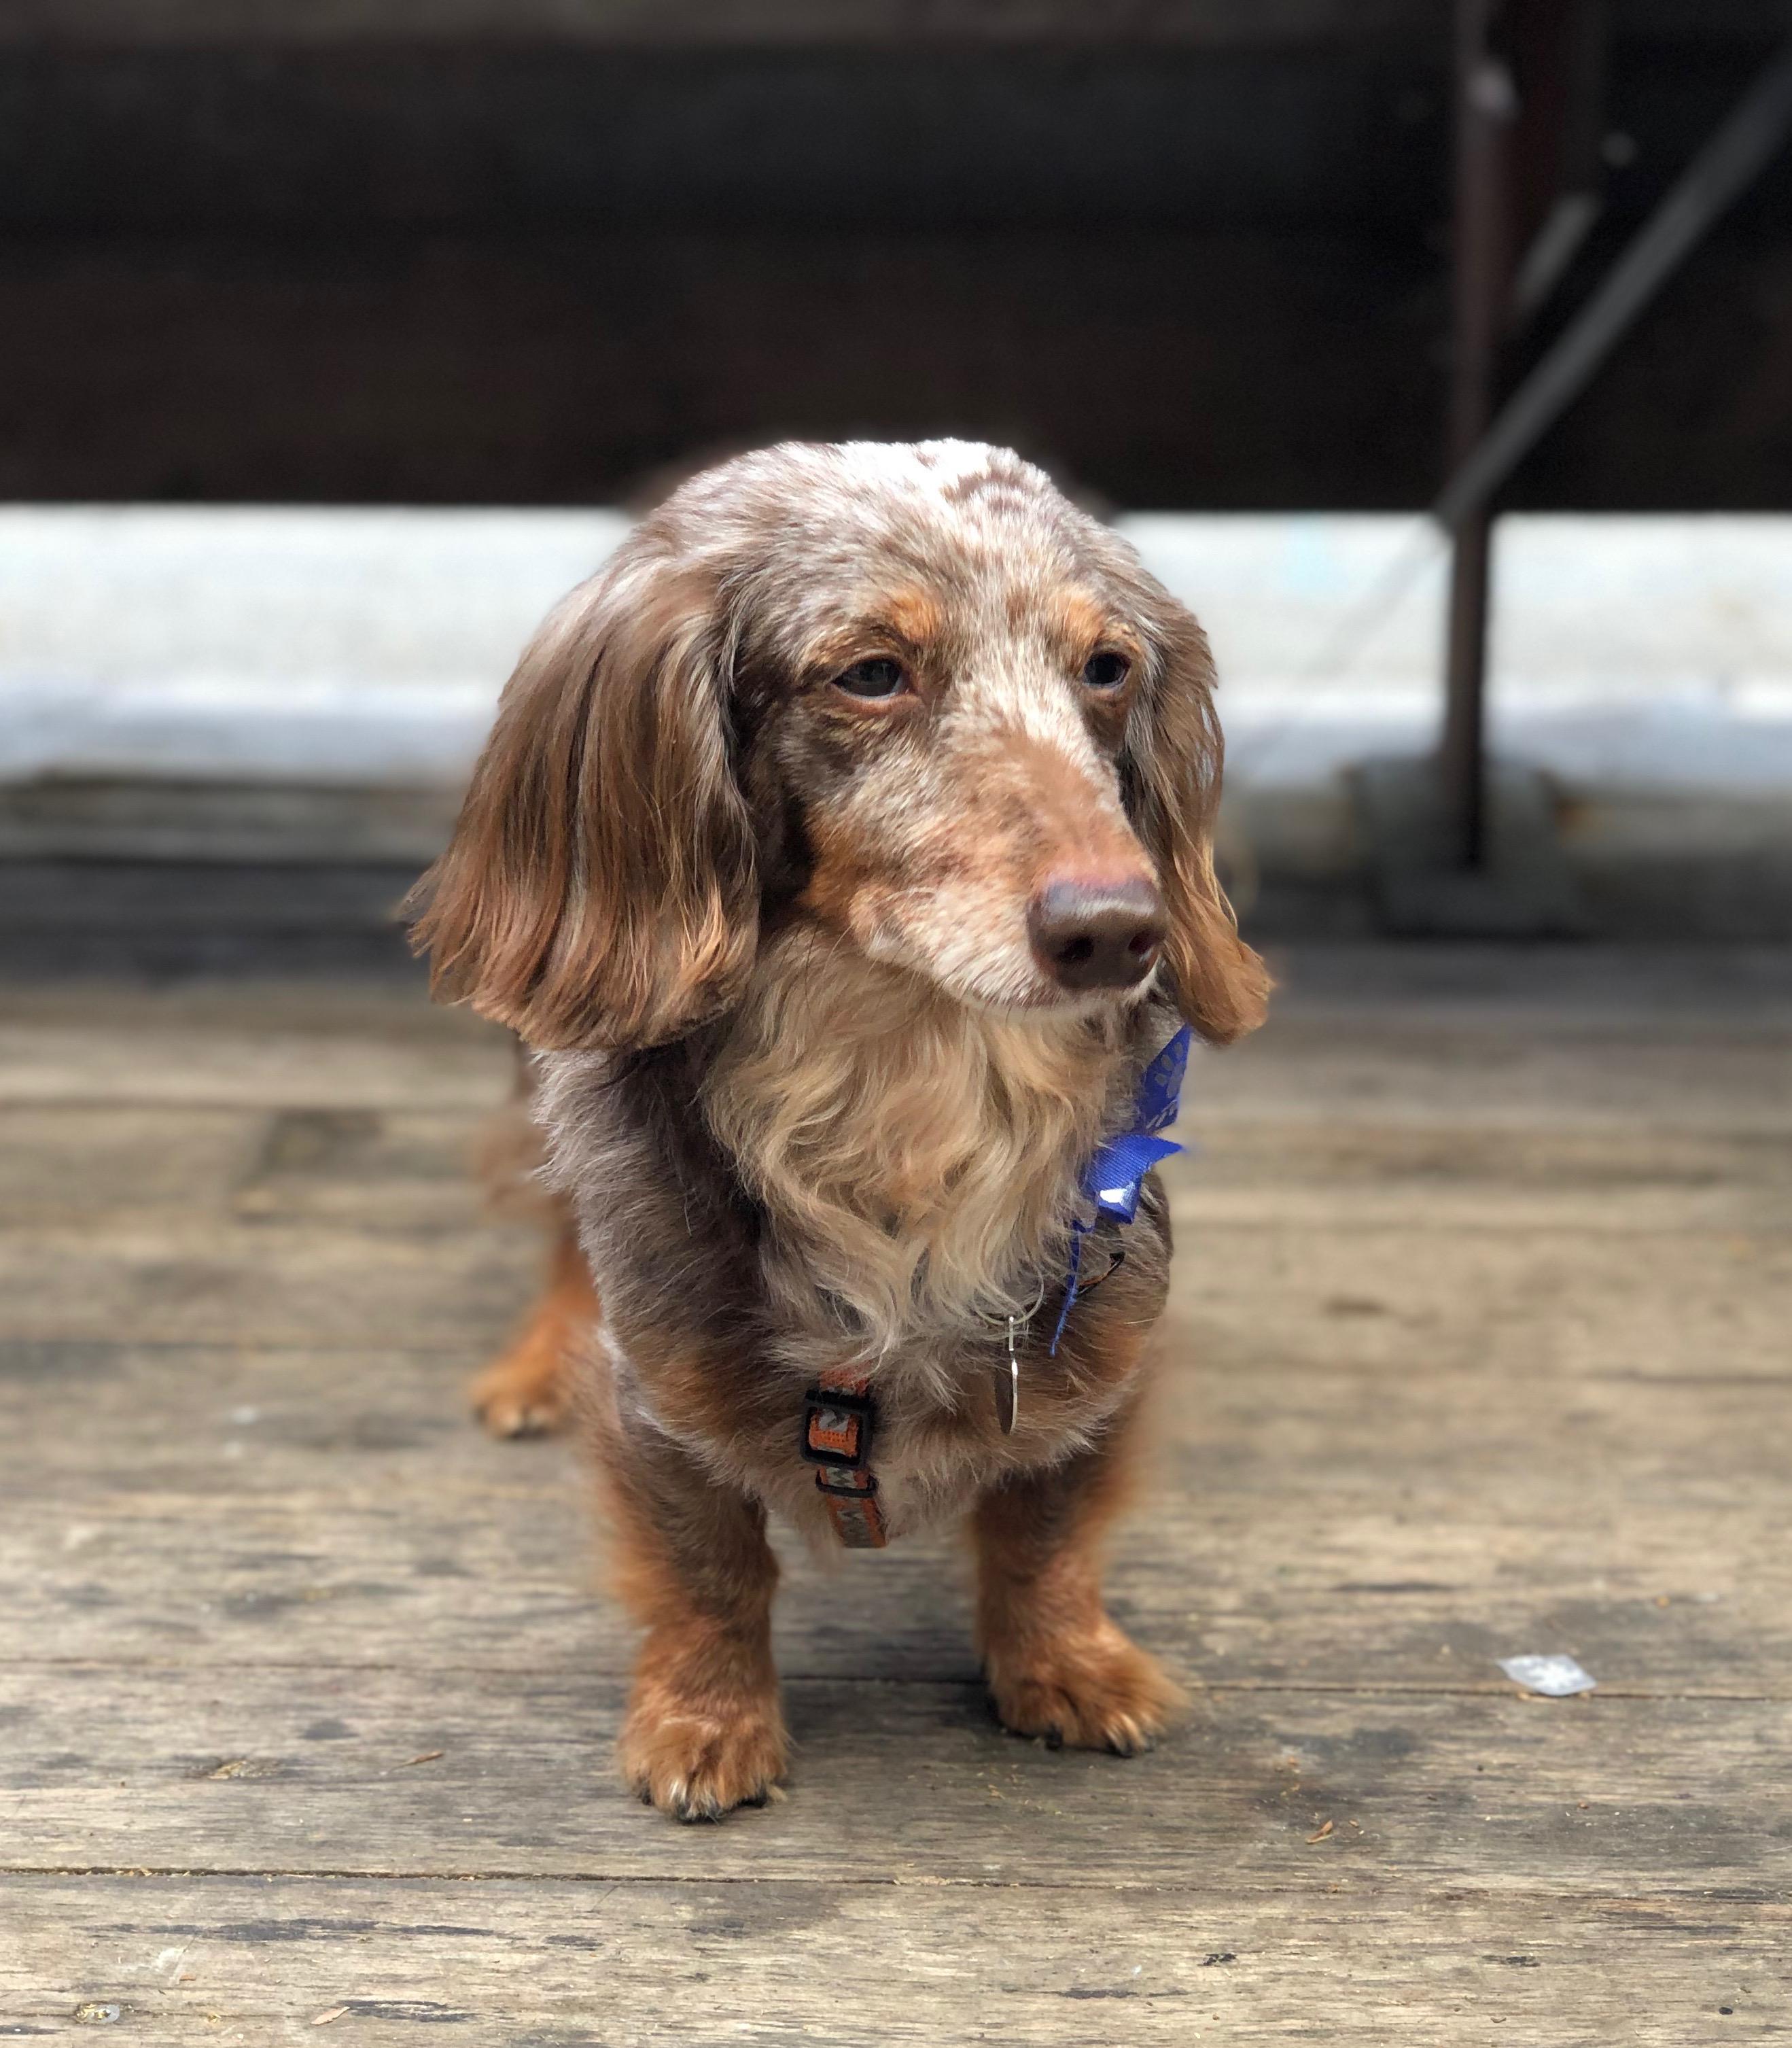 Piebald Miniature Long-Haired Dachshund